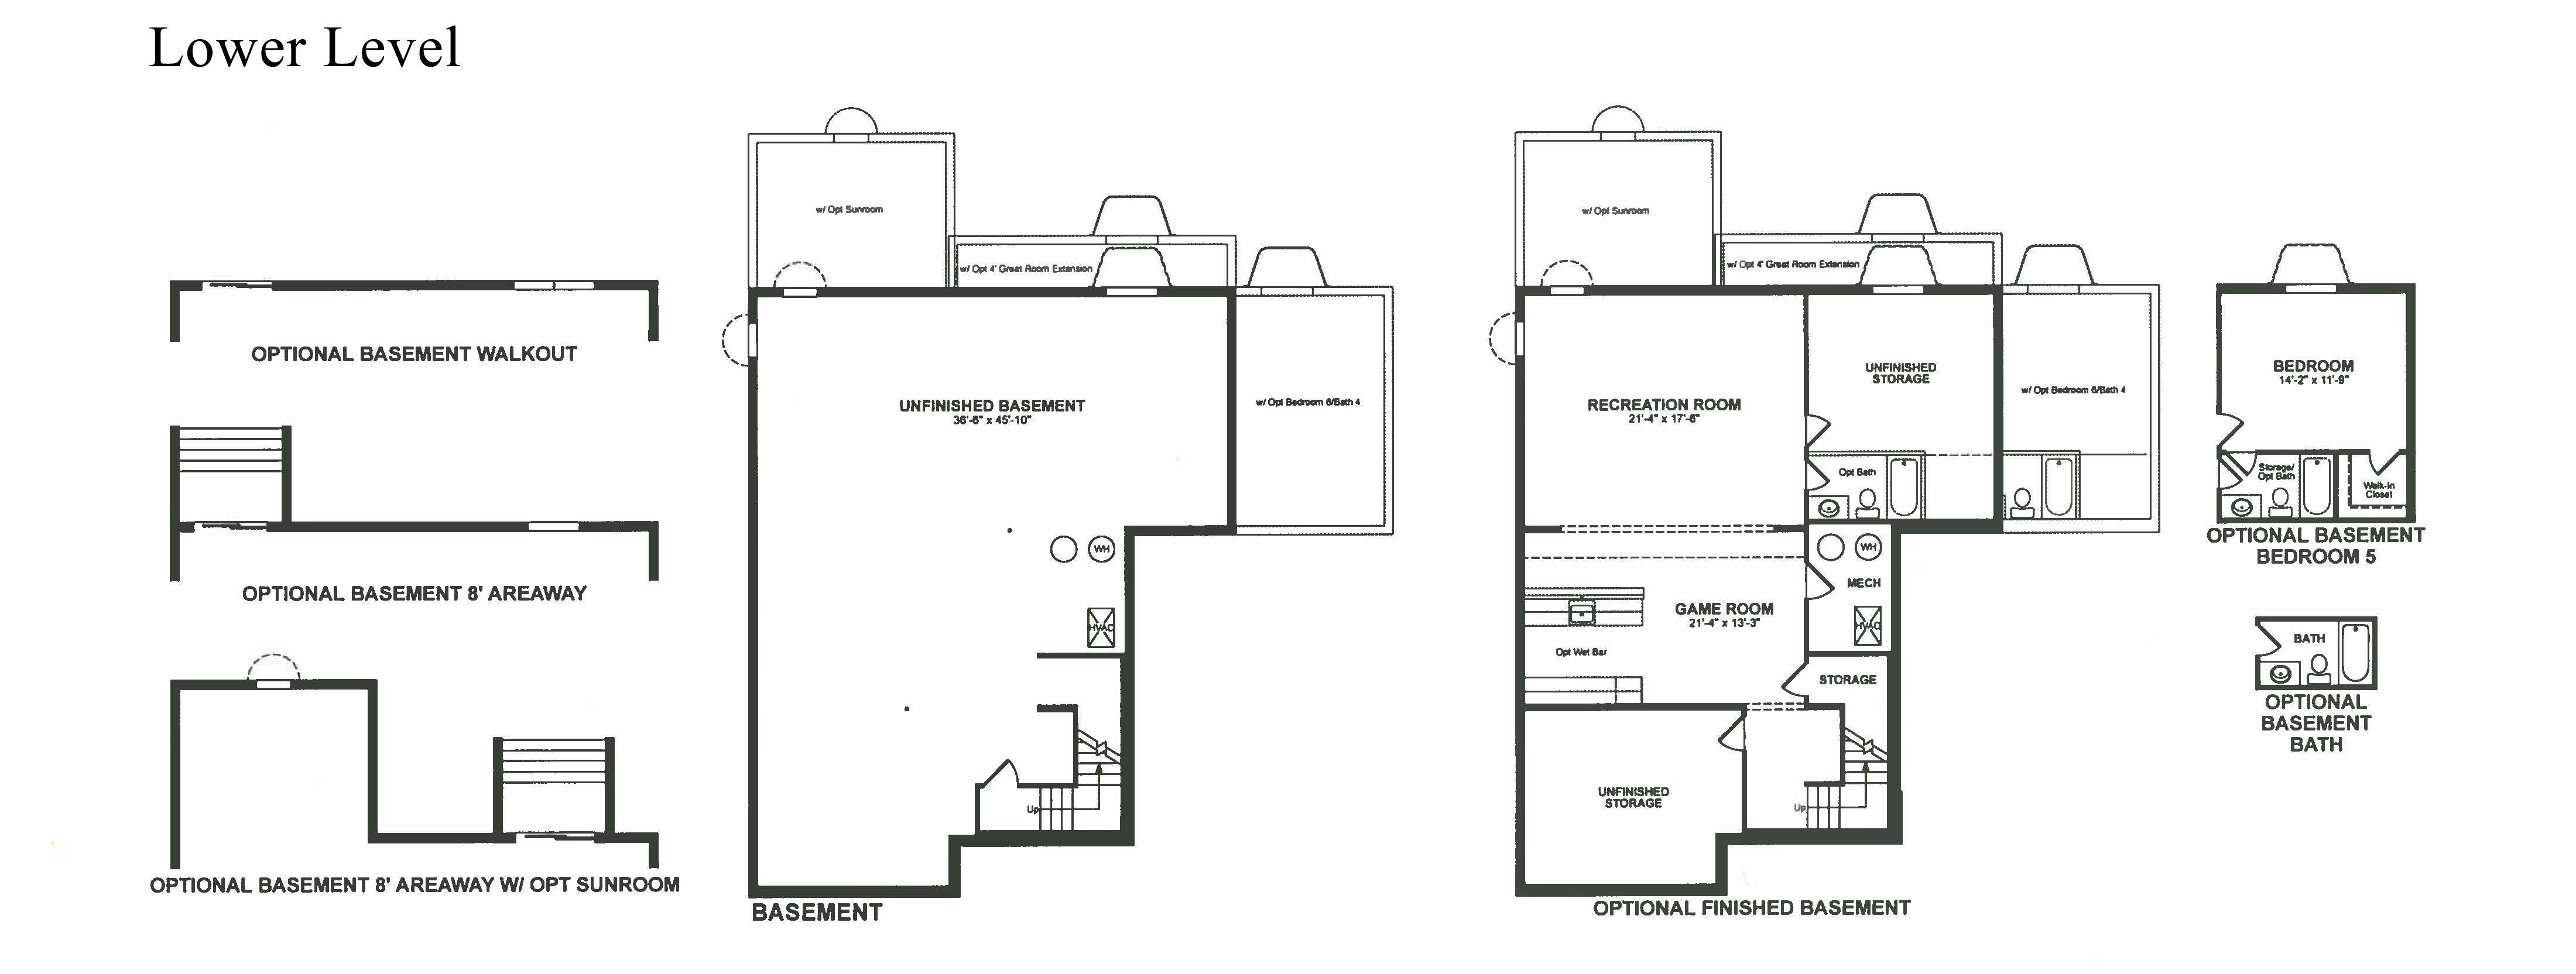 Willowsford Winslow Model Floor Plan Lower Level